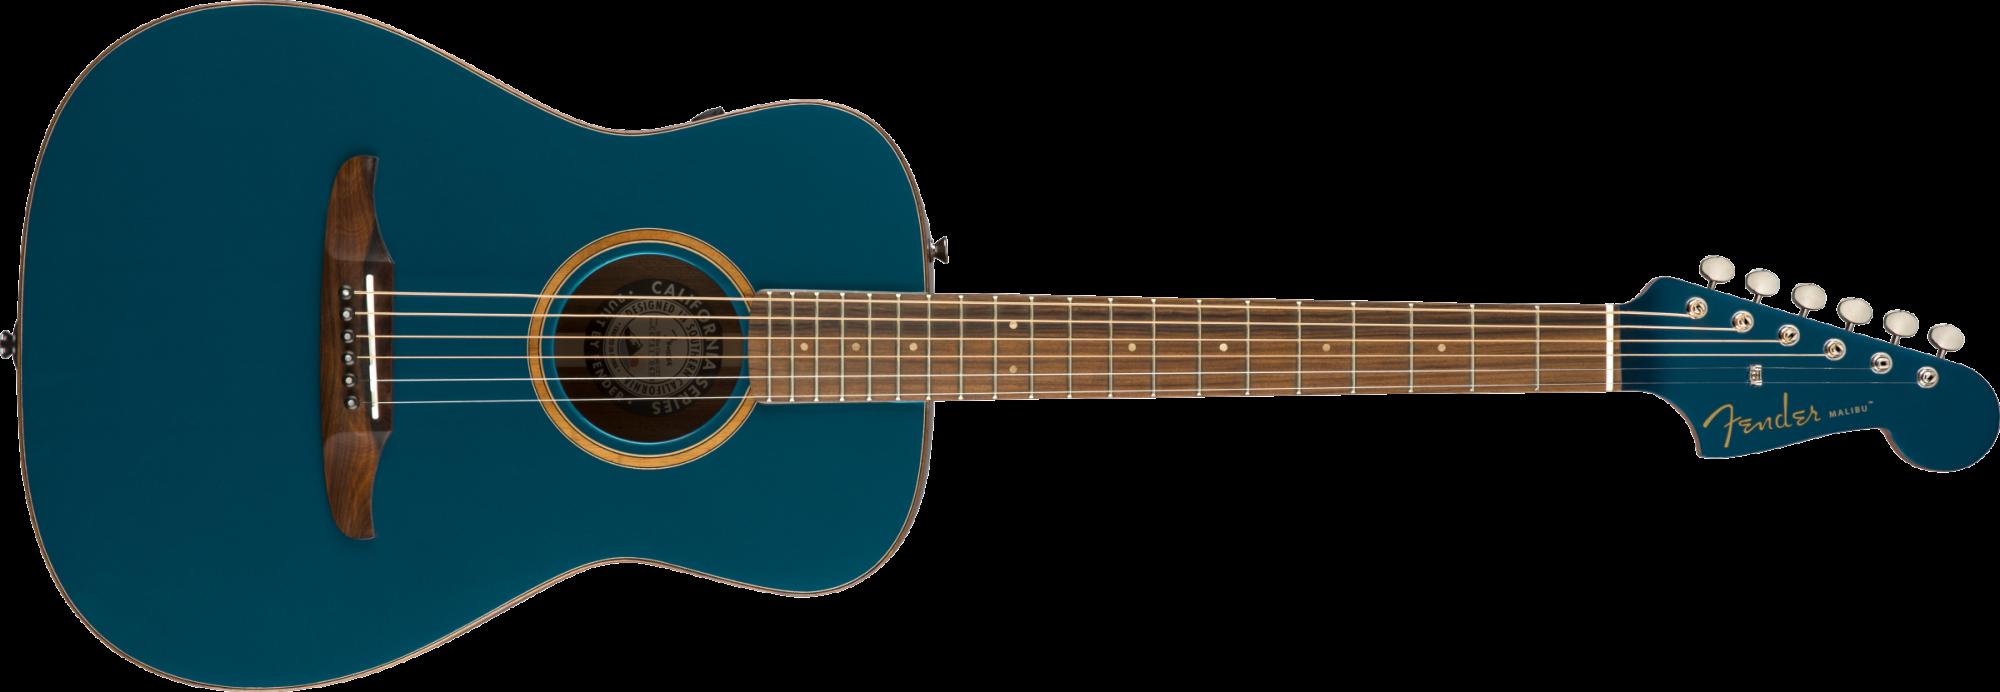 Fender Malibu Classic Acoustic/Electric Guitar - Cosmic Turquoise w/Bag